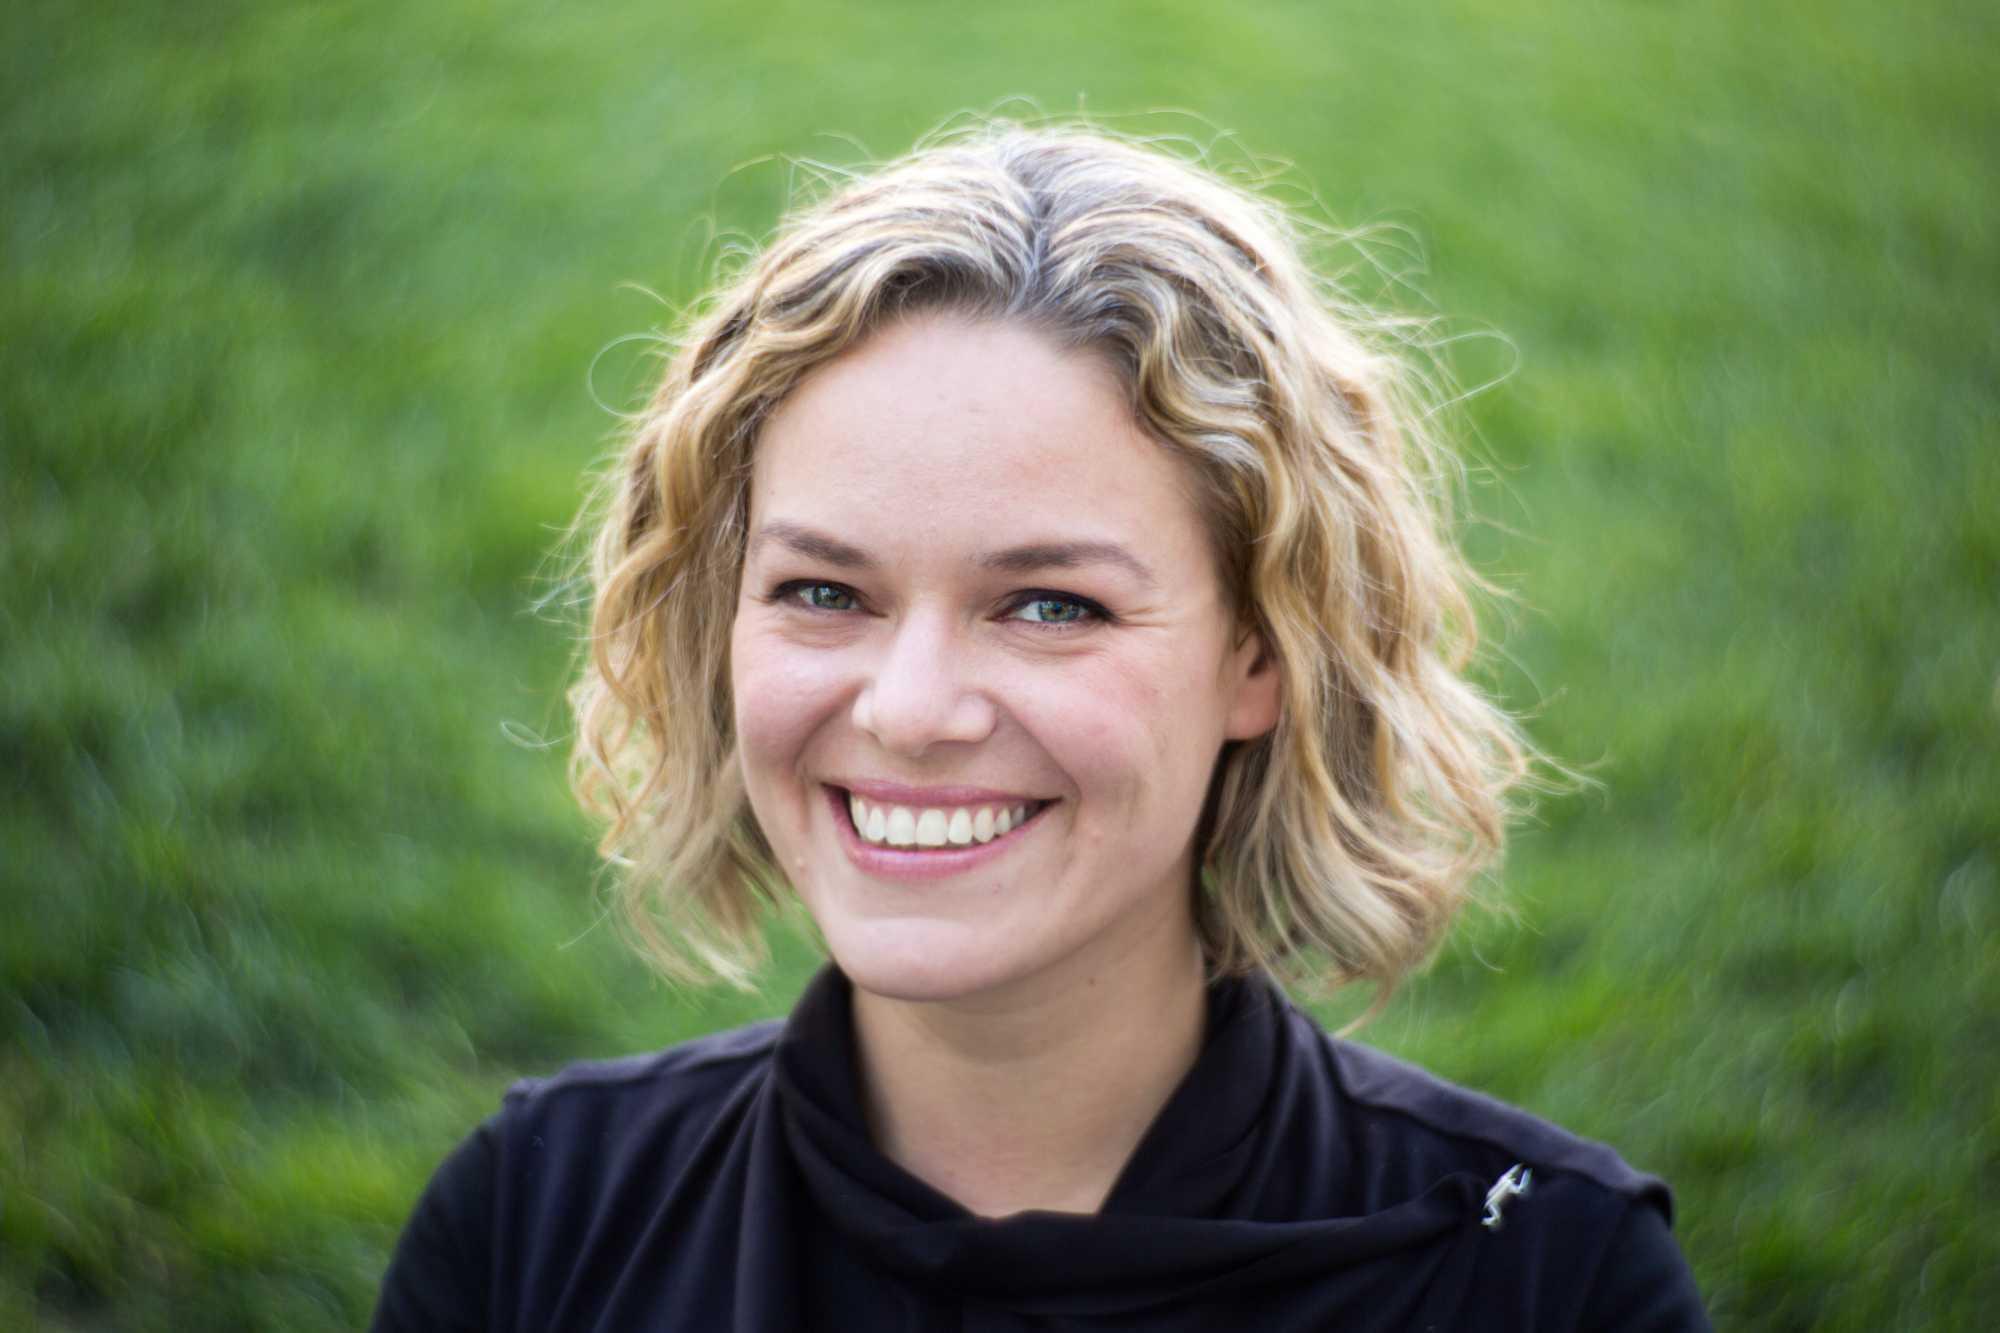 Katherine Maher, neue Chefin der Wikimedia Foundation